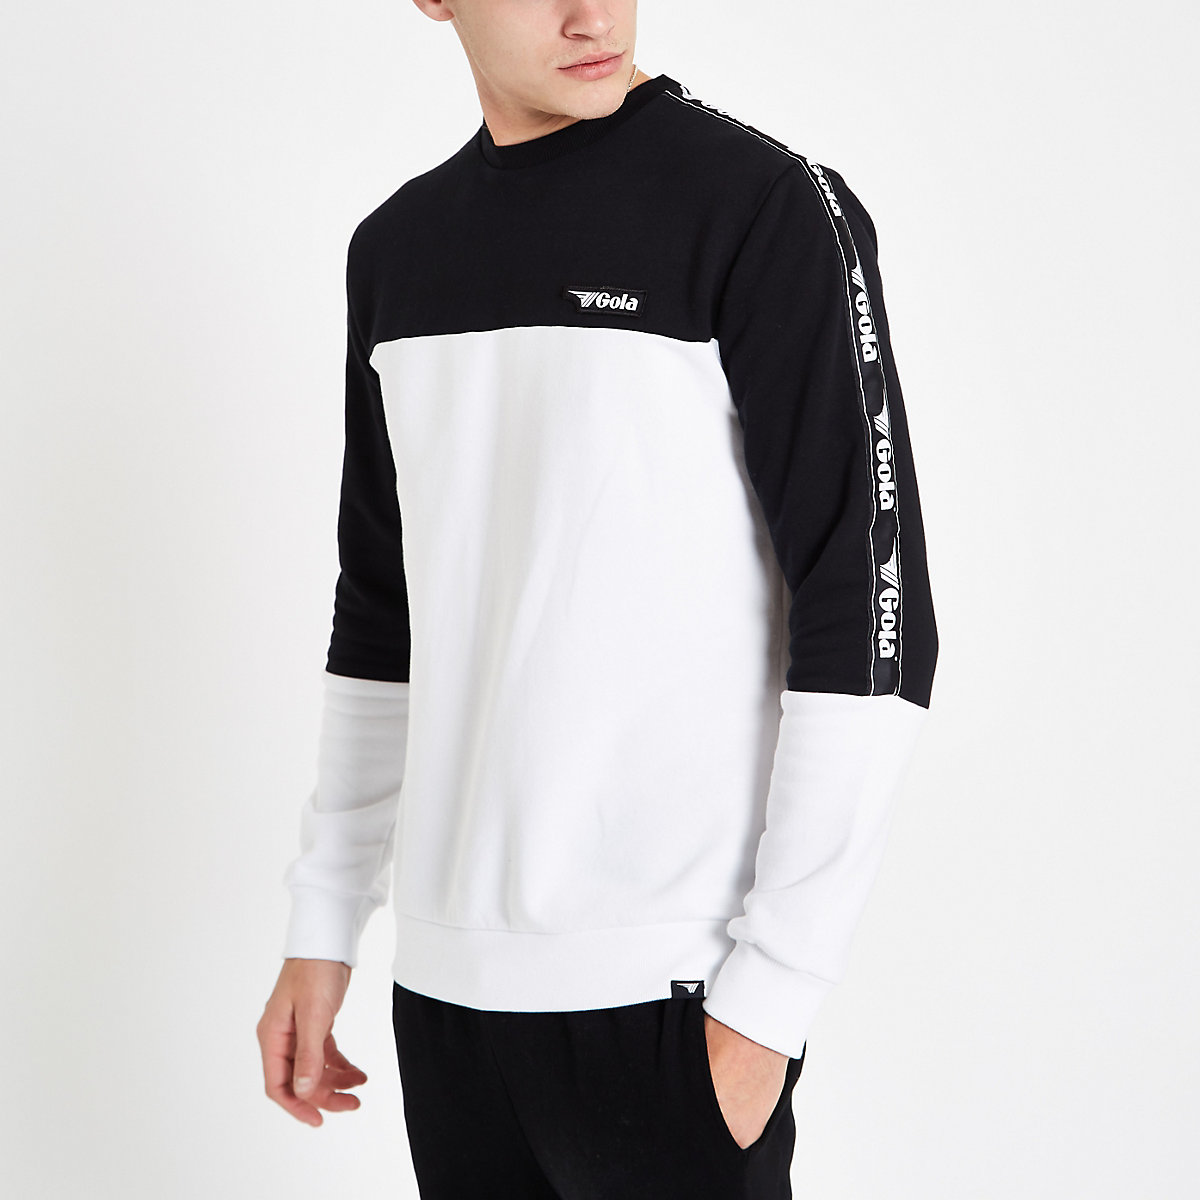 Gola white color block sweatshirt